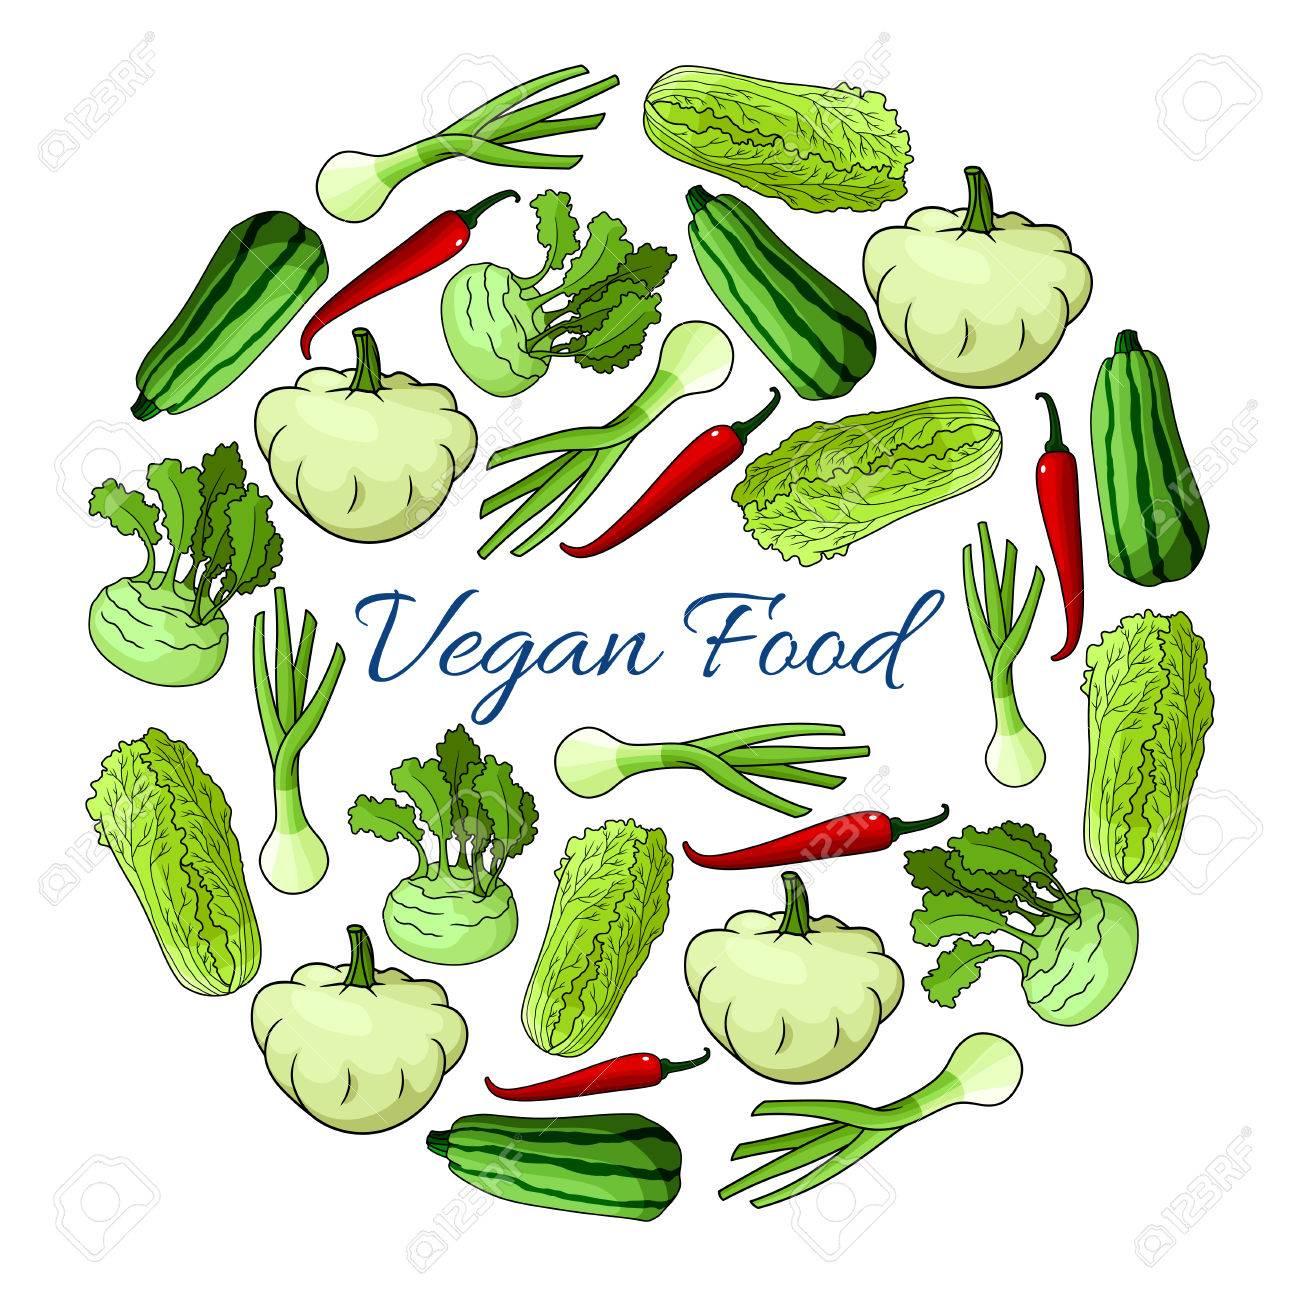 veggies poster vegan organic vegetables nutrition food greens